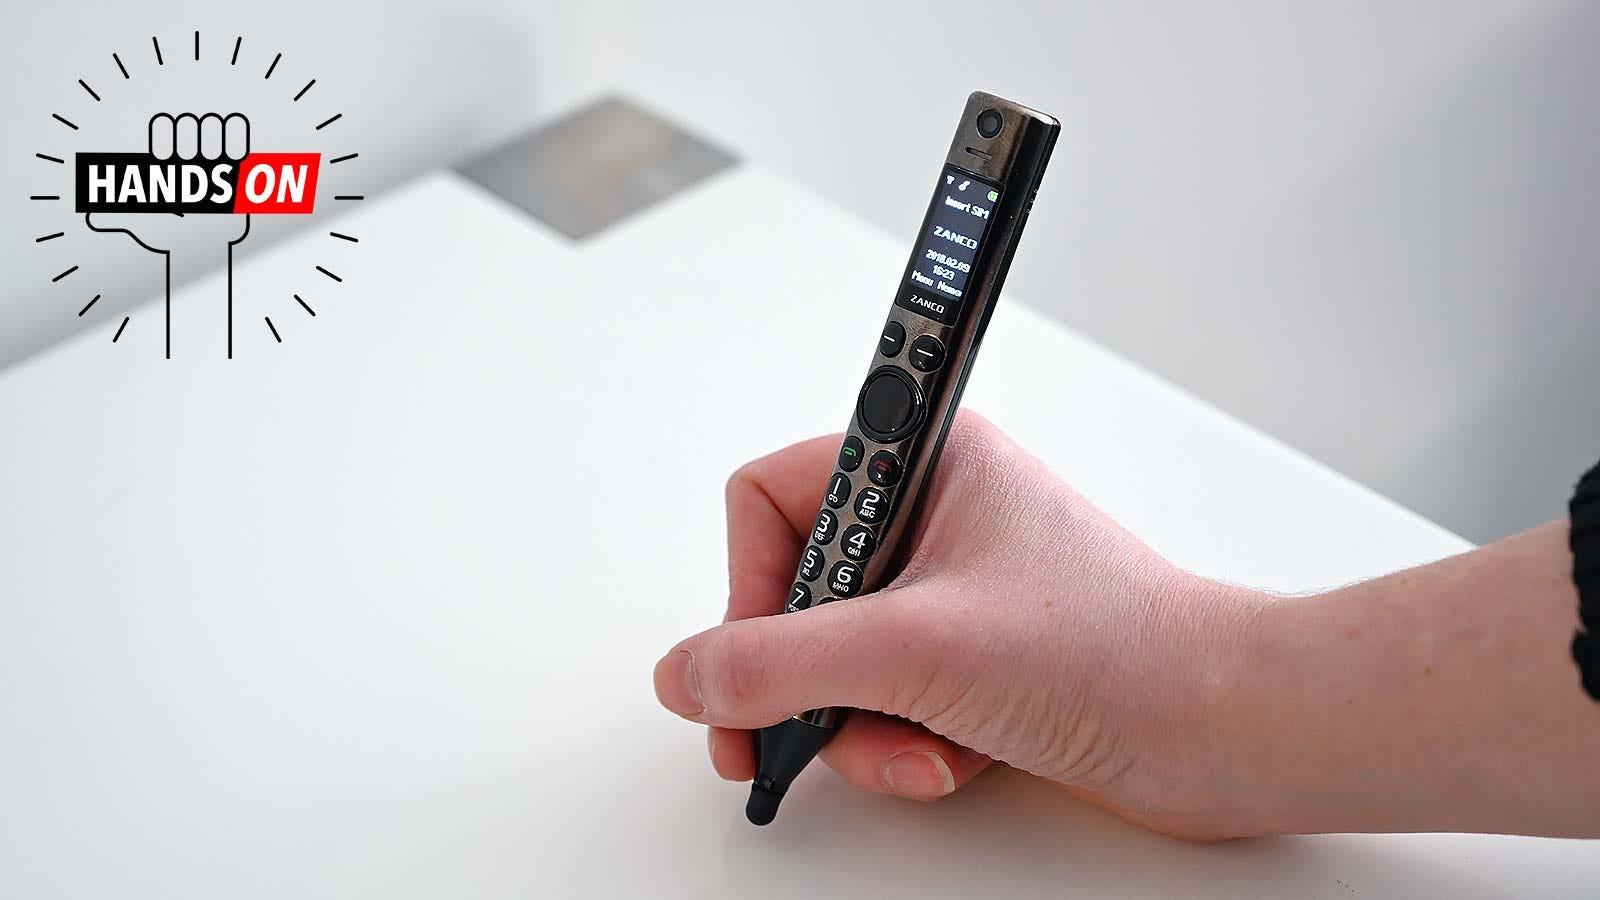 QnA VBage The Zanco Smart Pen Is a Modern Day Talkboy